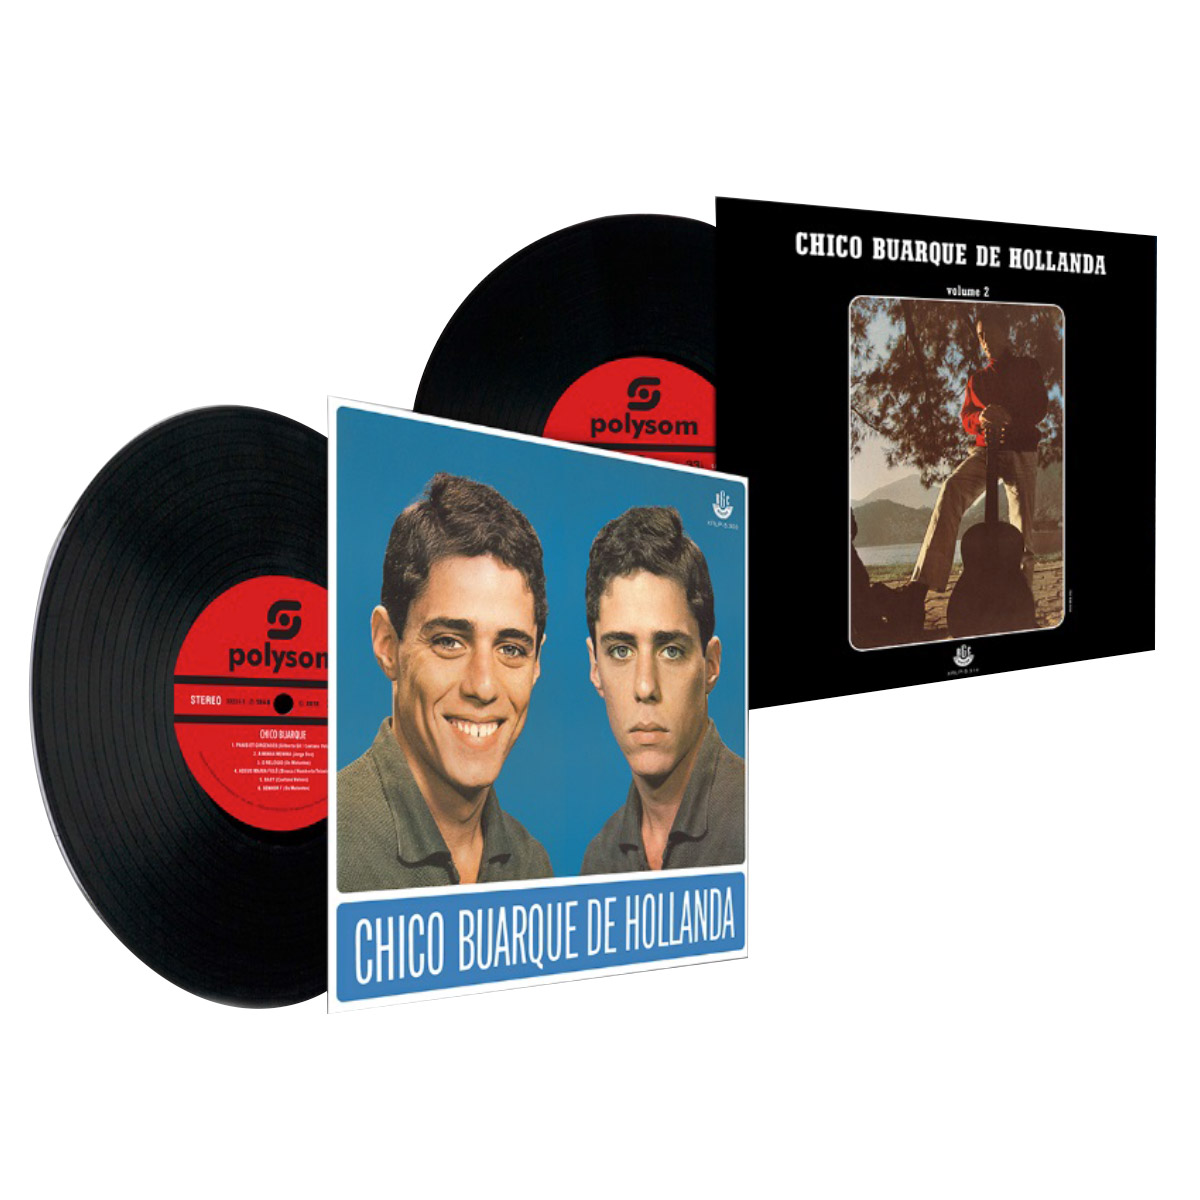 LP Box Chico Buarque de Hollanda Os Primeiros Anos